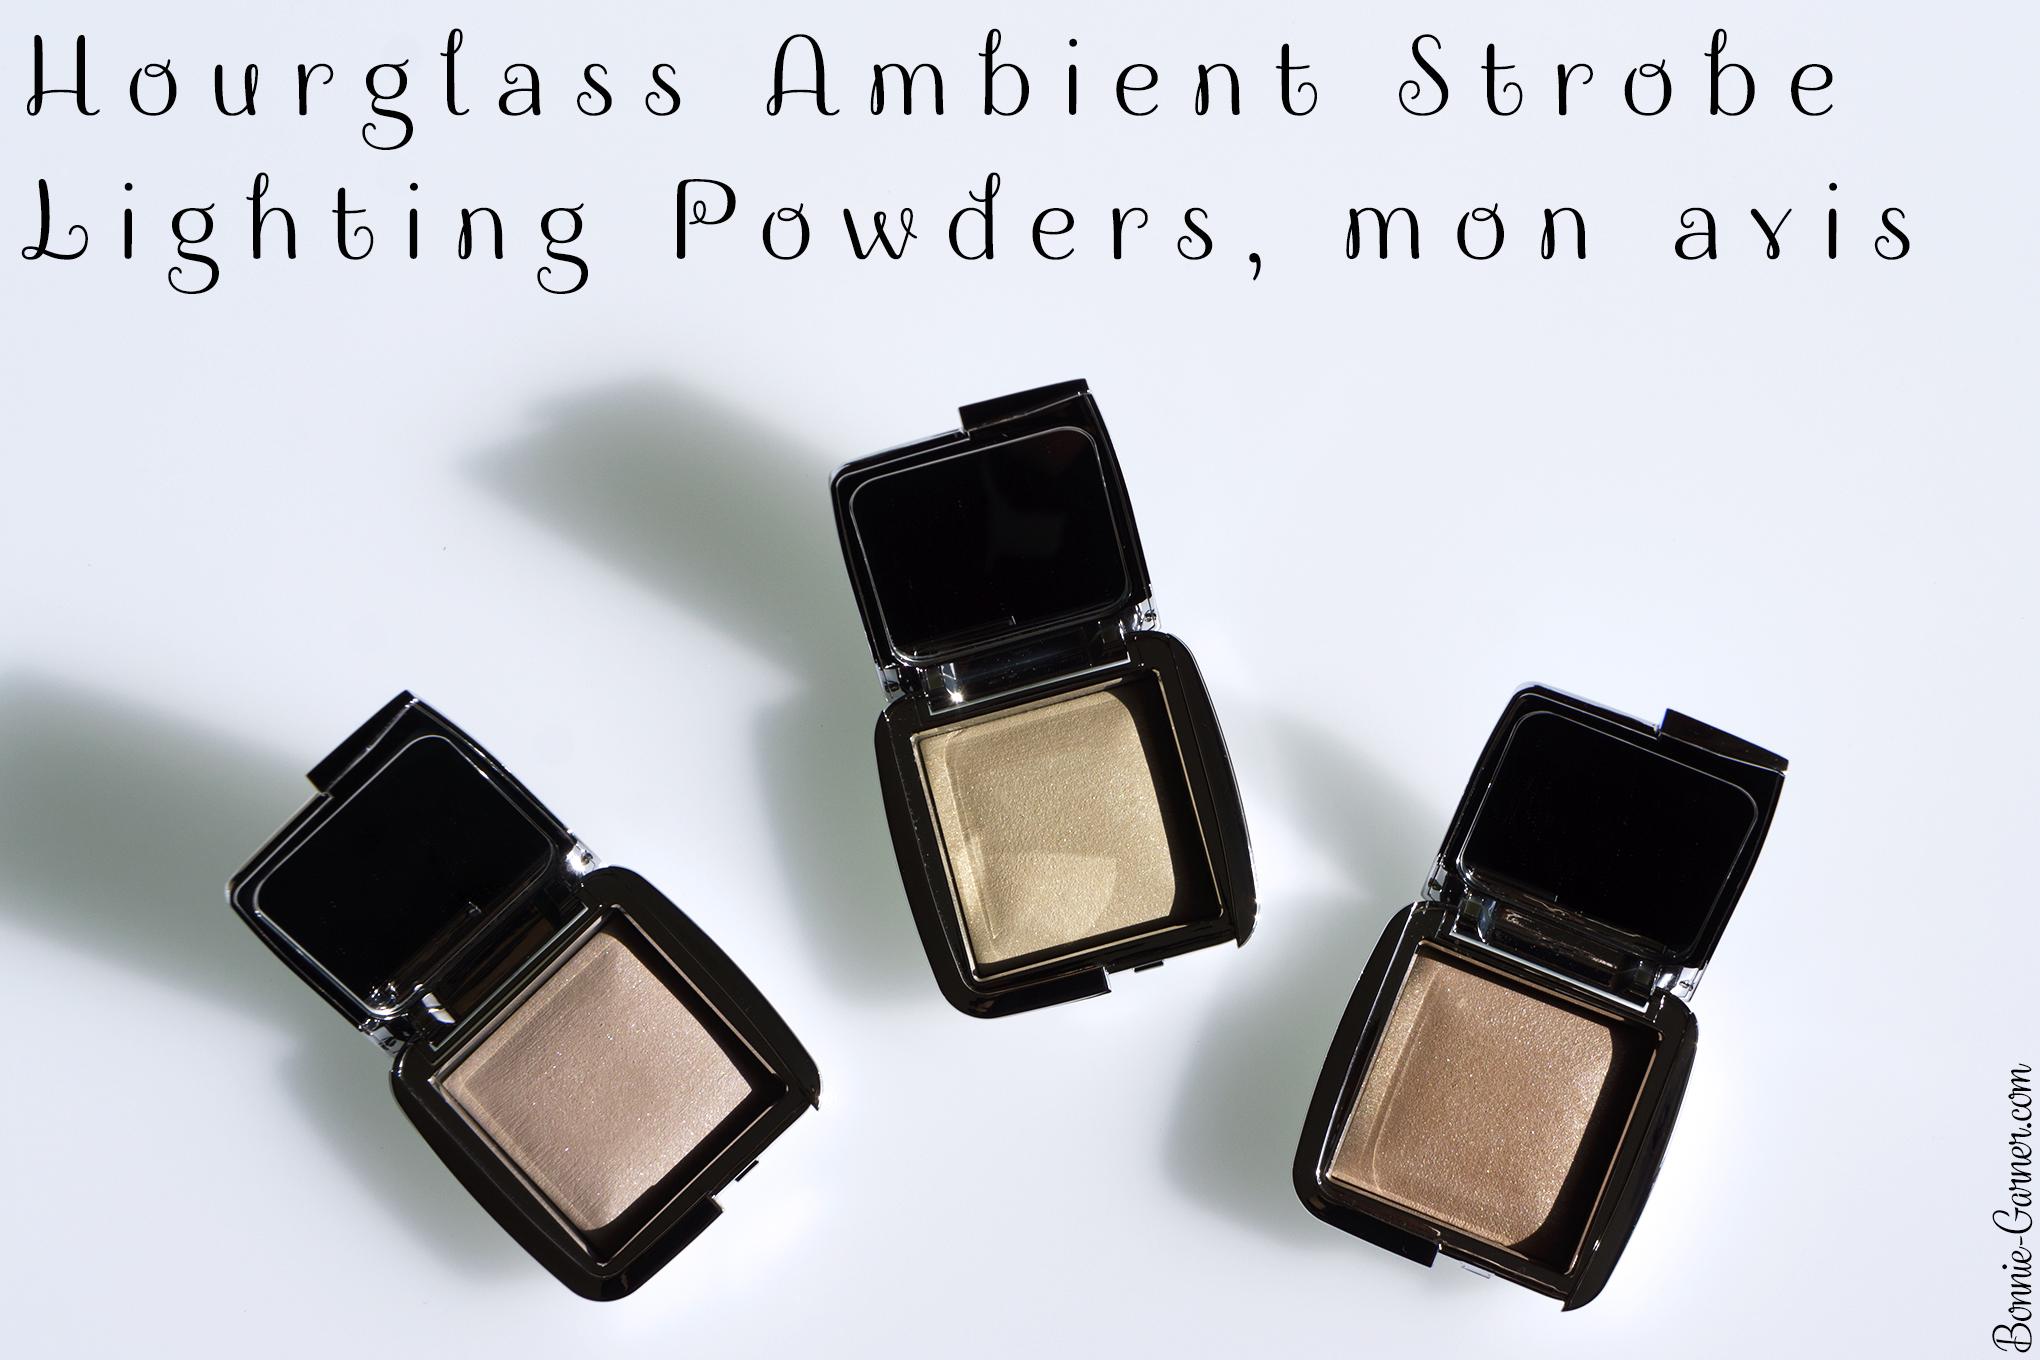 Hourglass Ambient Strobe Lighting Powders, mon avis